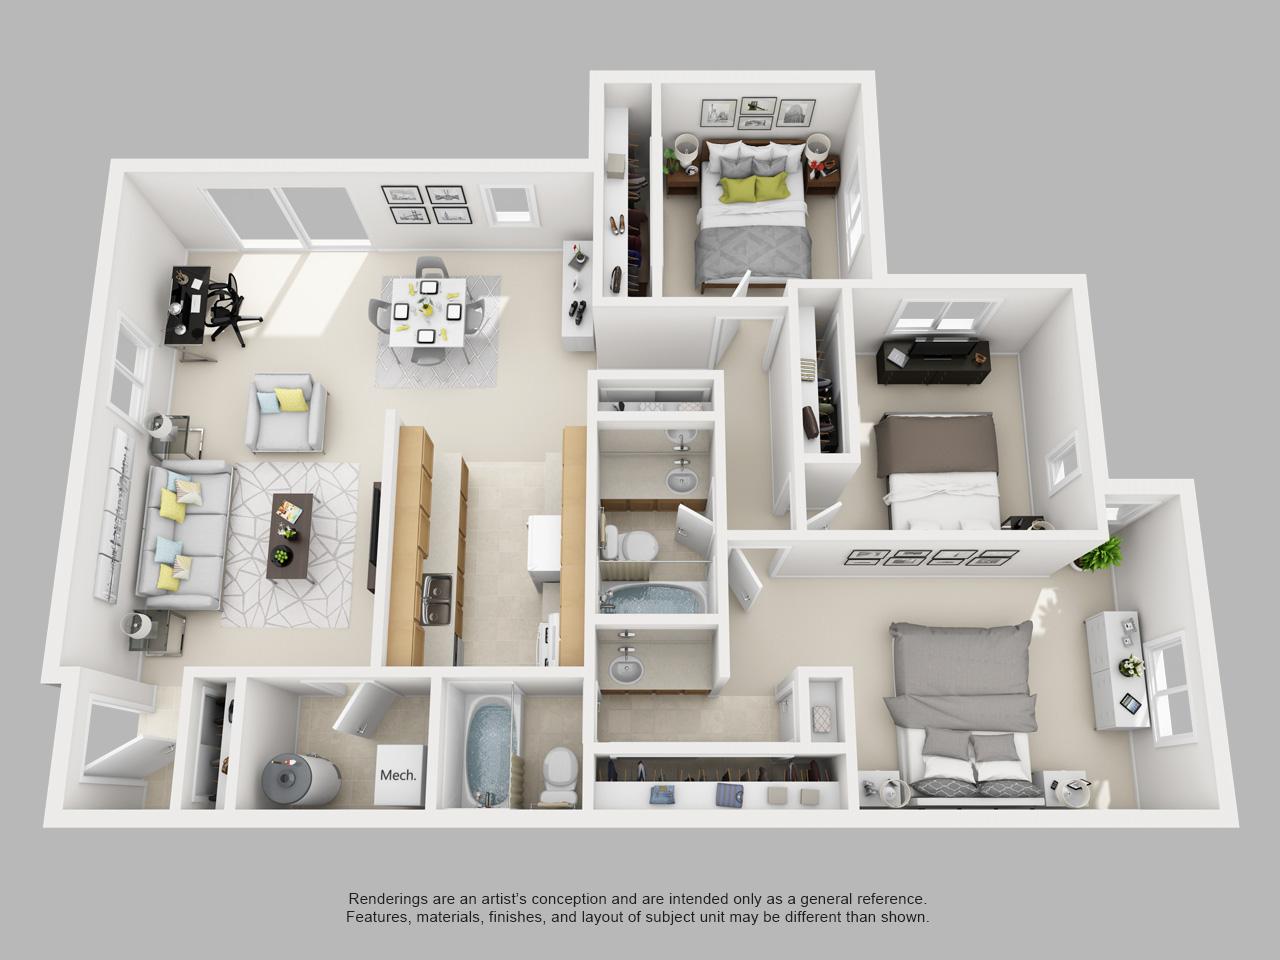 3 Bedroom at Four Seasons Yorktown Apartments